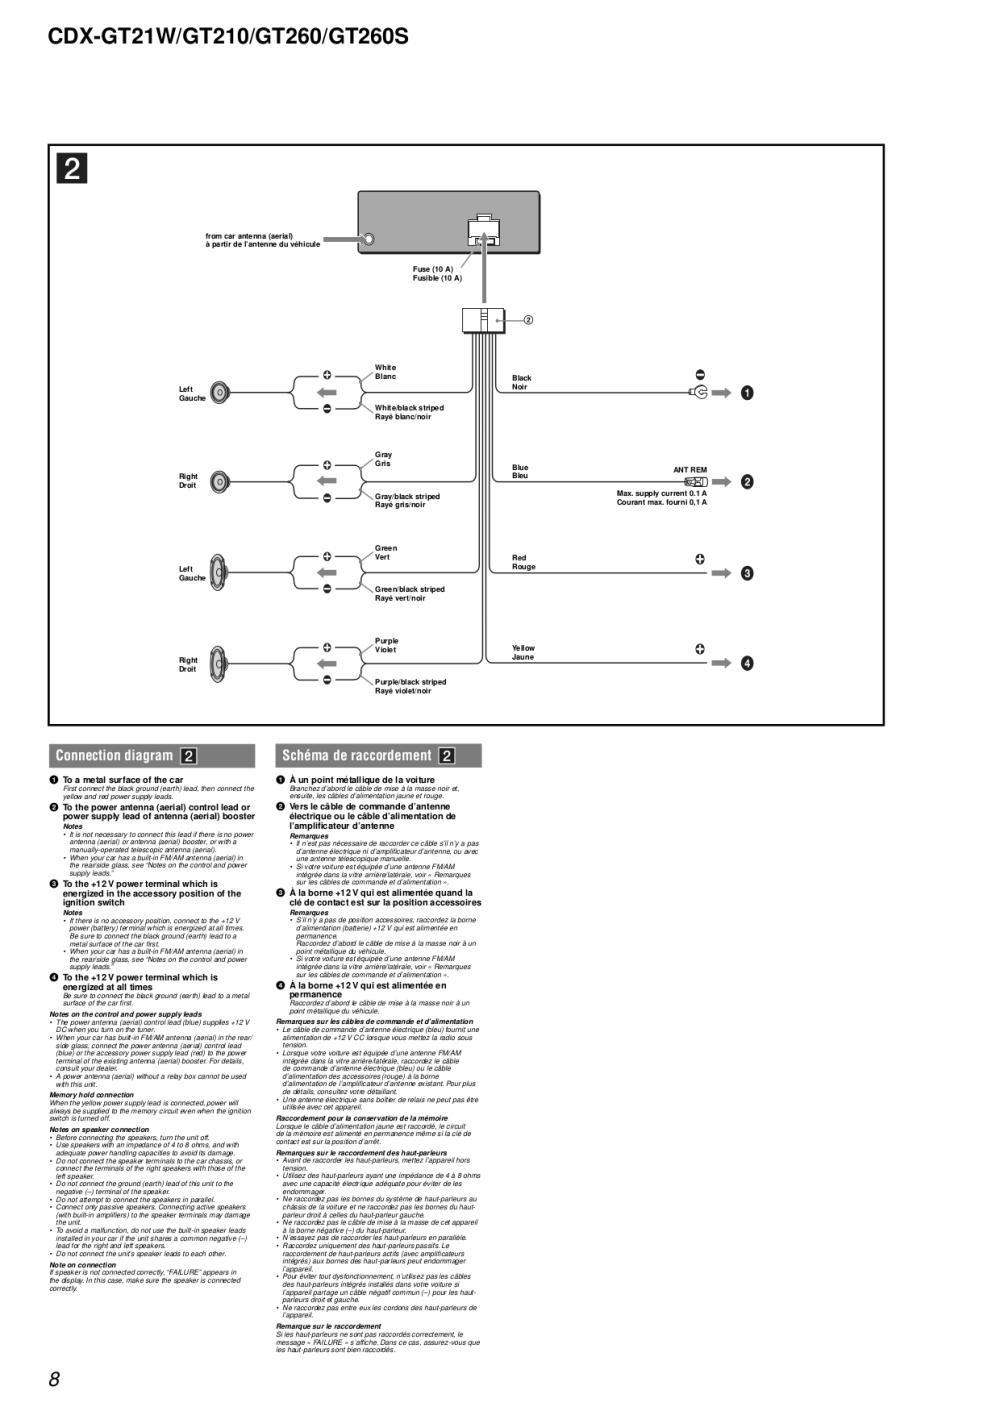 medium resolution of sony cdx gt210 wiring diagram